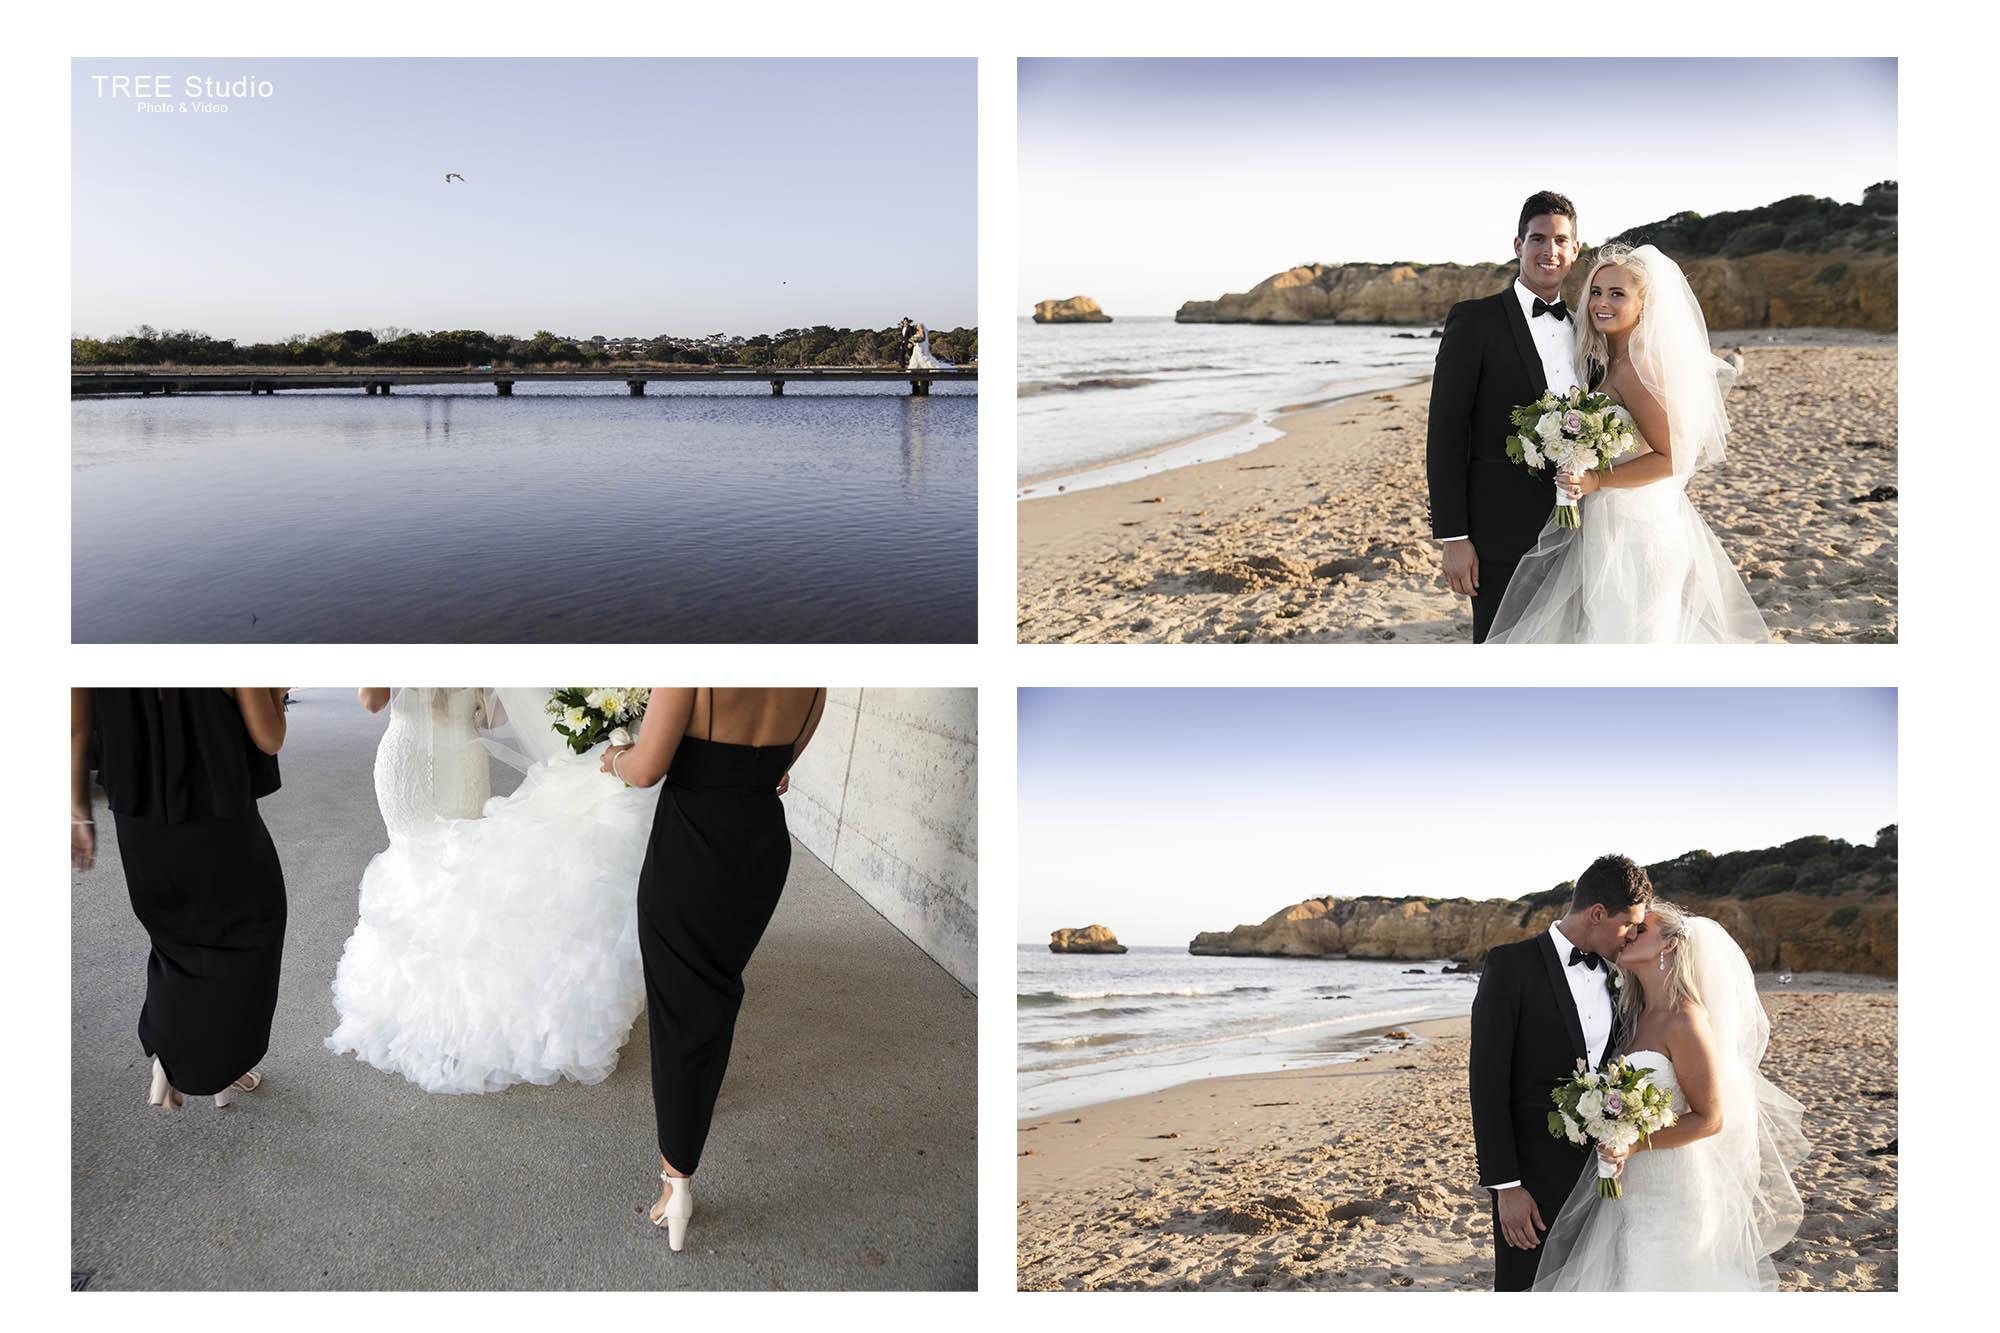 RACV Torquay Wedding Photography 28 - Karlie & Matt's Wedding Photography @ RACV Torquay Resort